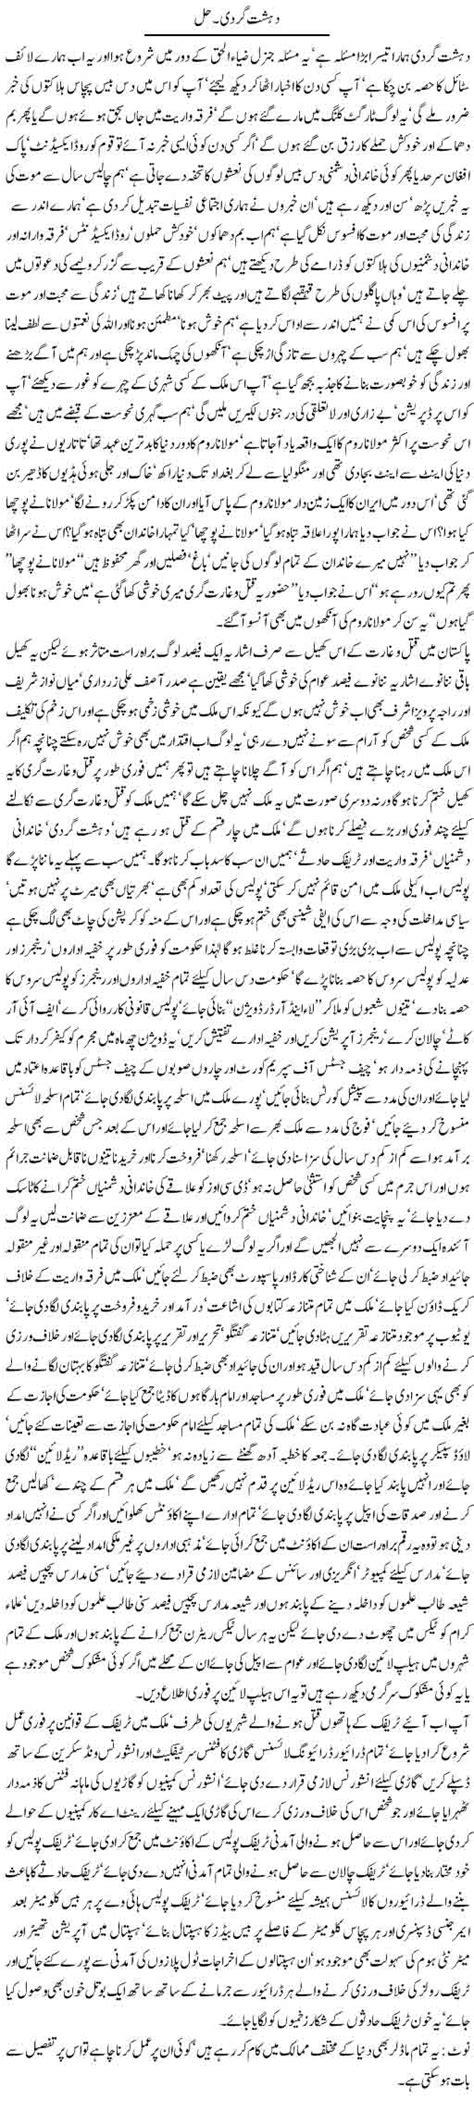 Essay For Terrorism In Pakistan by How To Write An Essay In Urdu